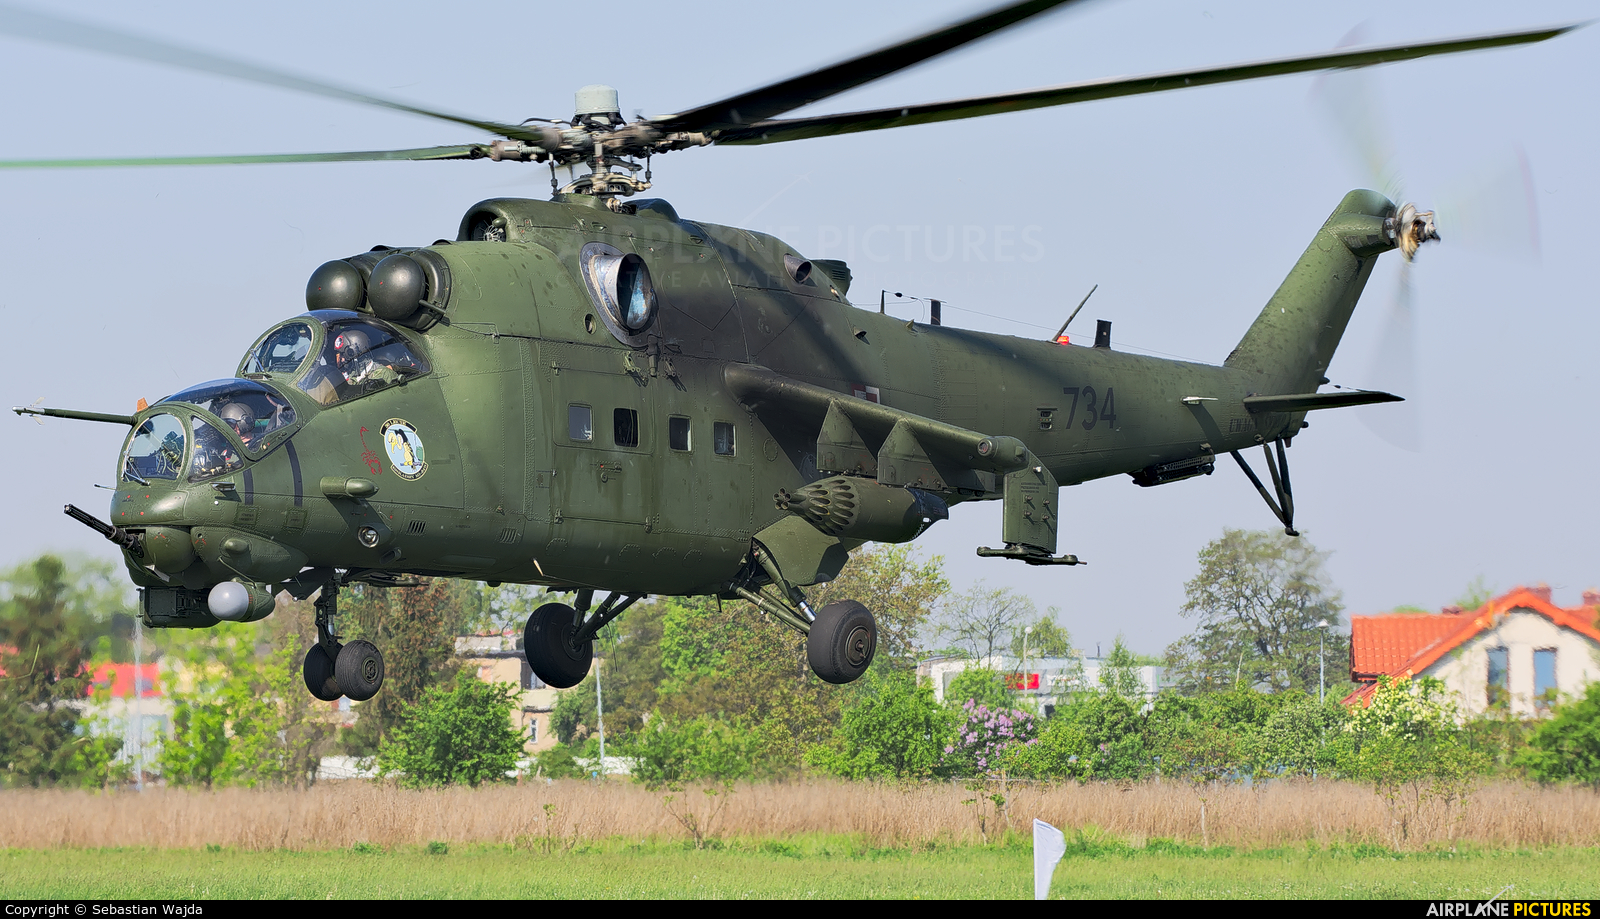 Poland - Army 734 aircraft at Inowrocław